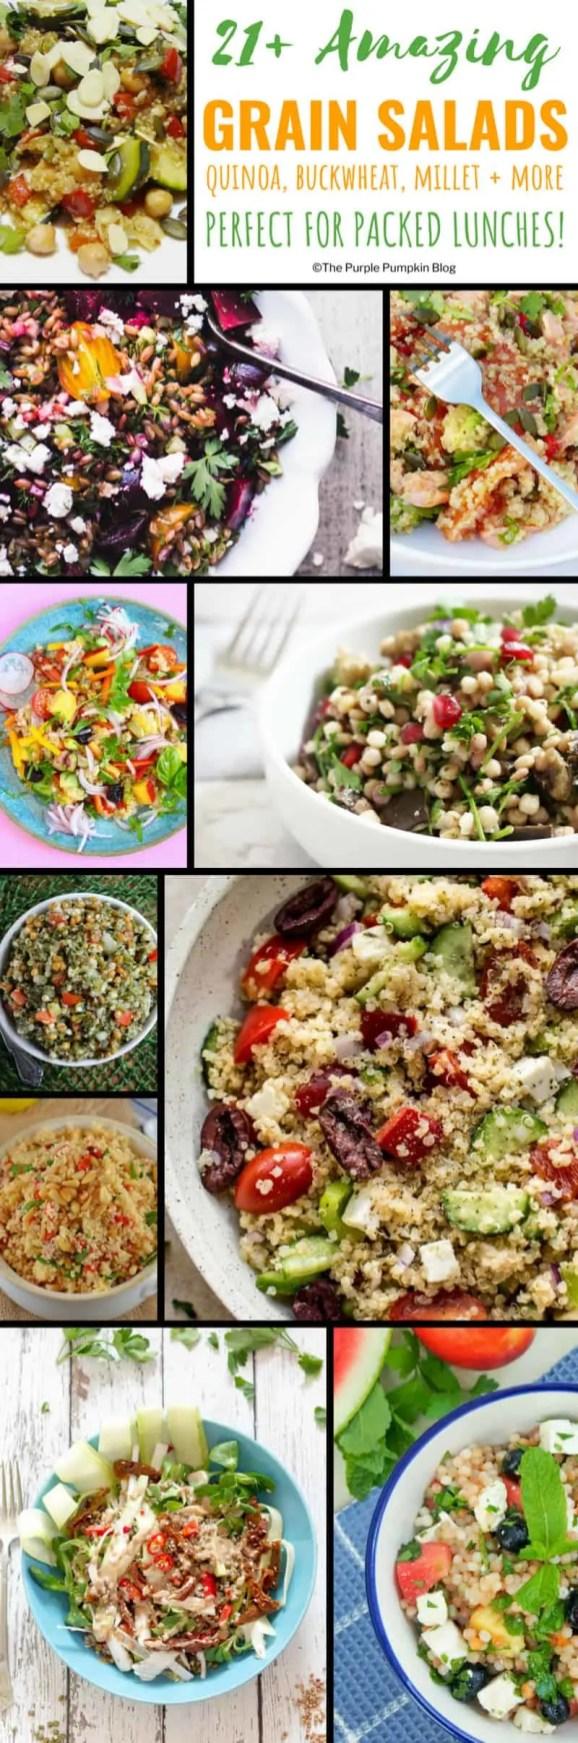 Amazing Grain Salads